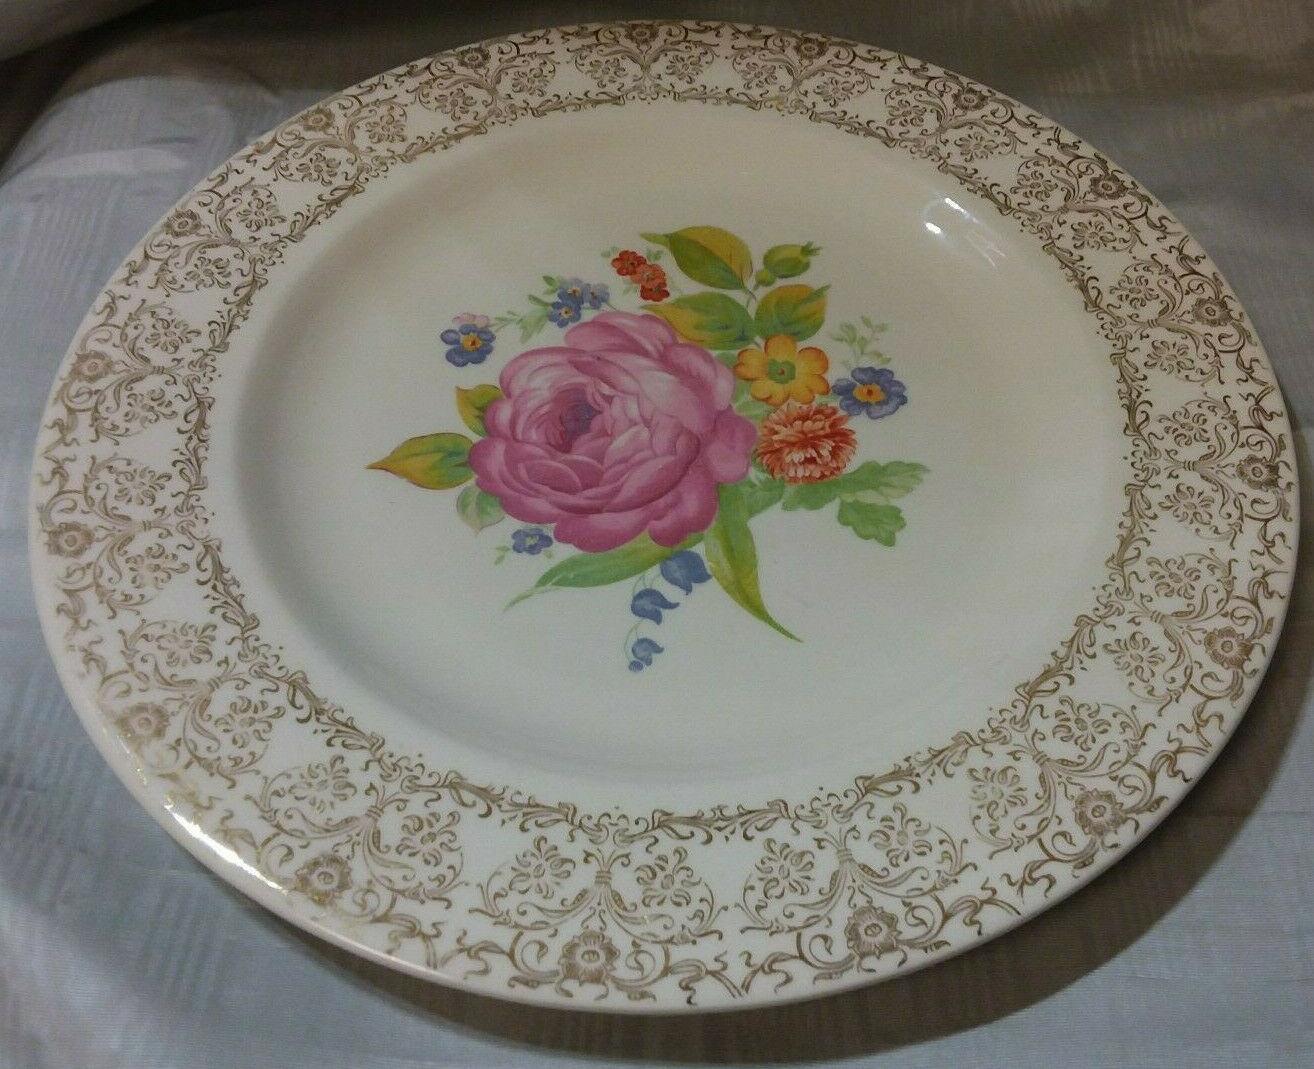 Tea Rose by Royal China Plate USA 1950/'s.